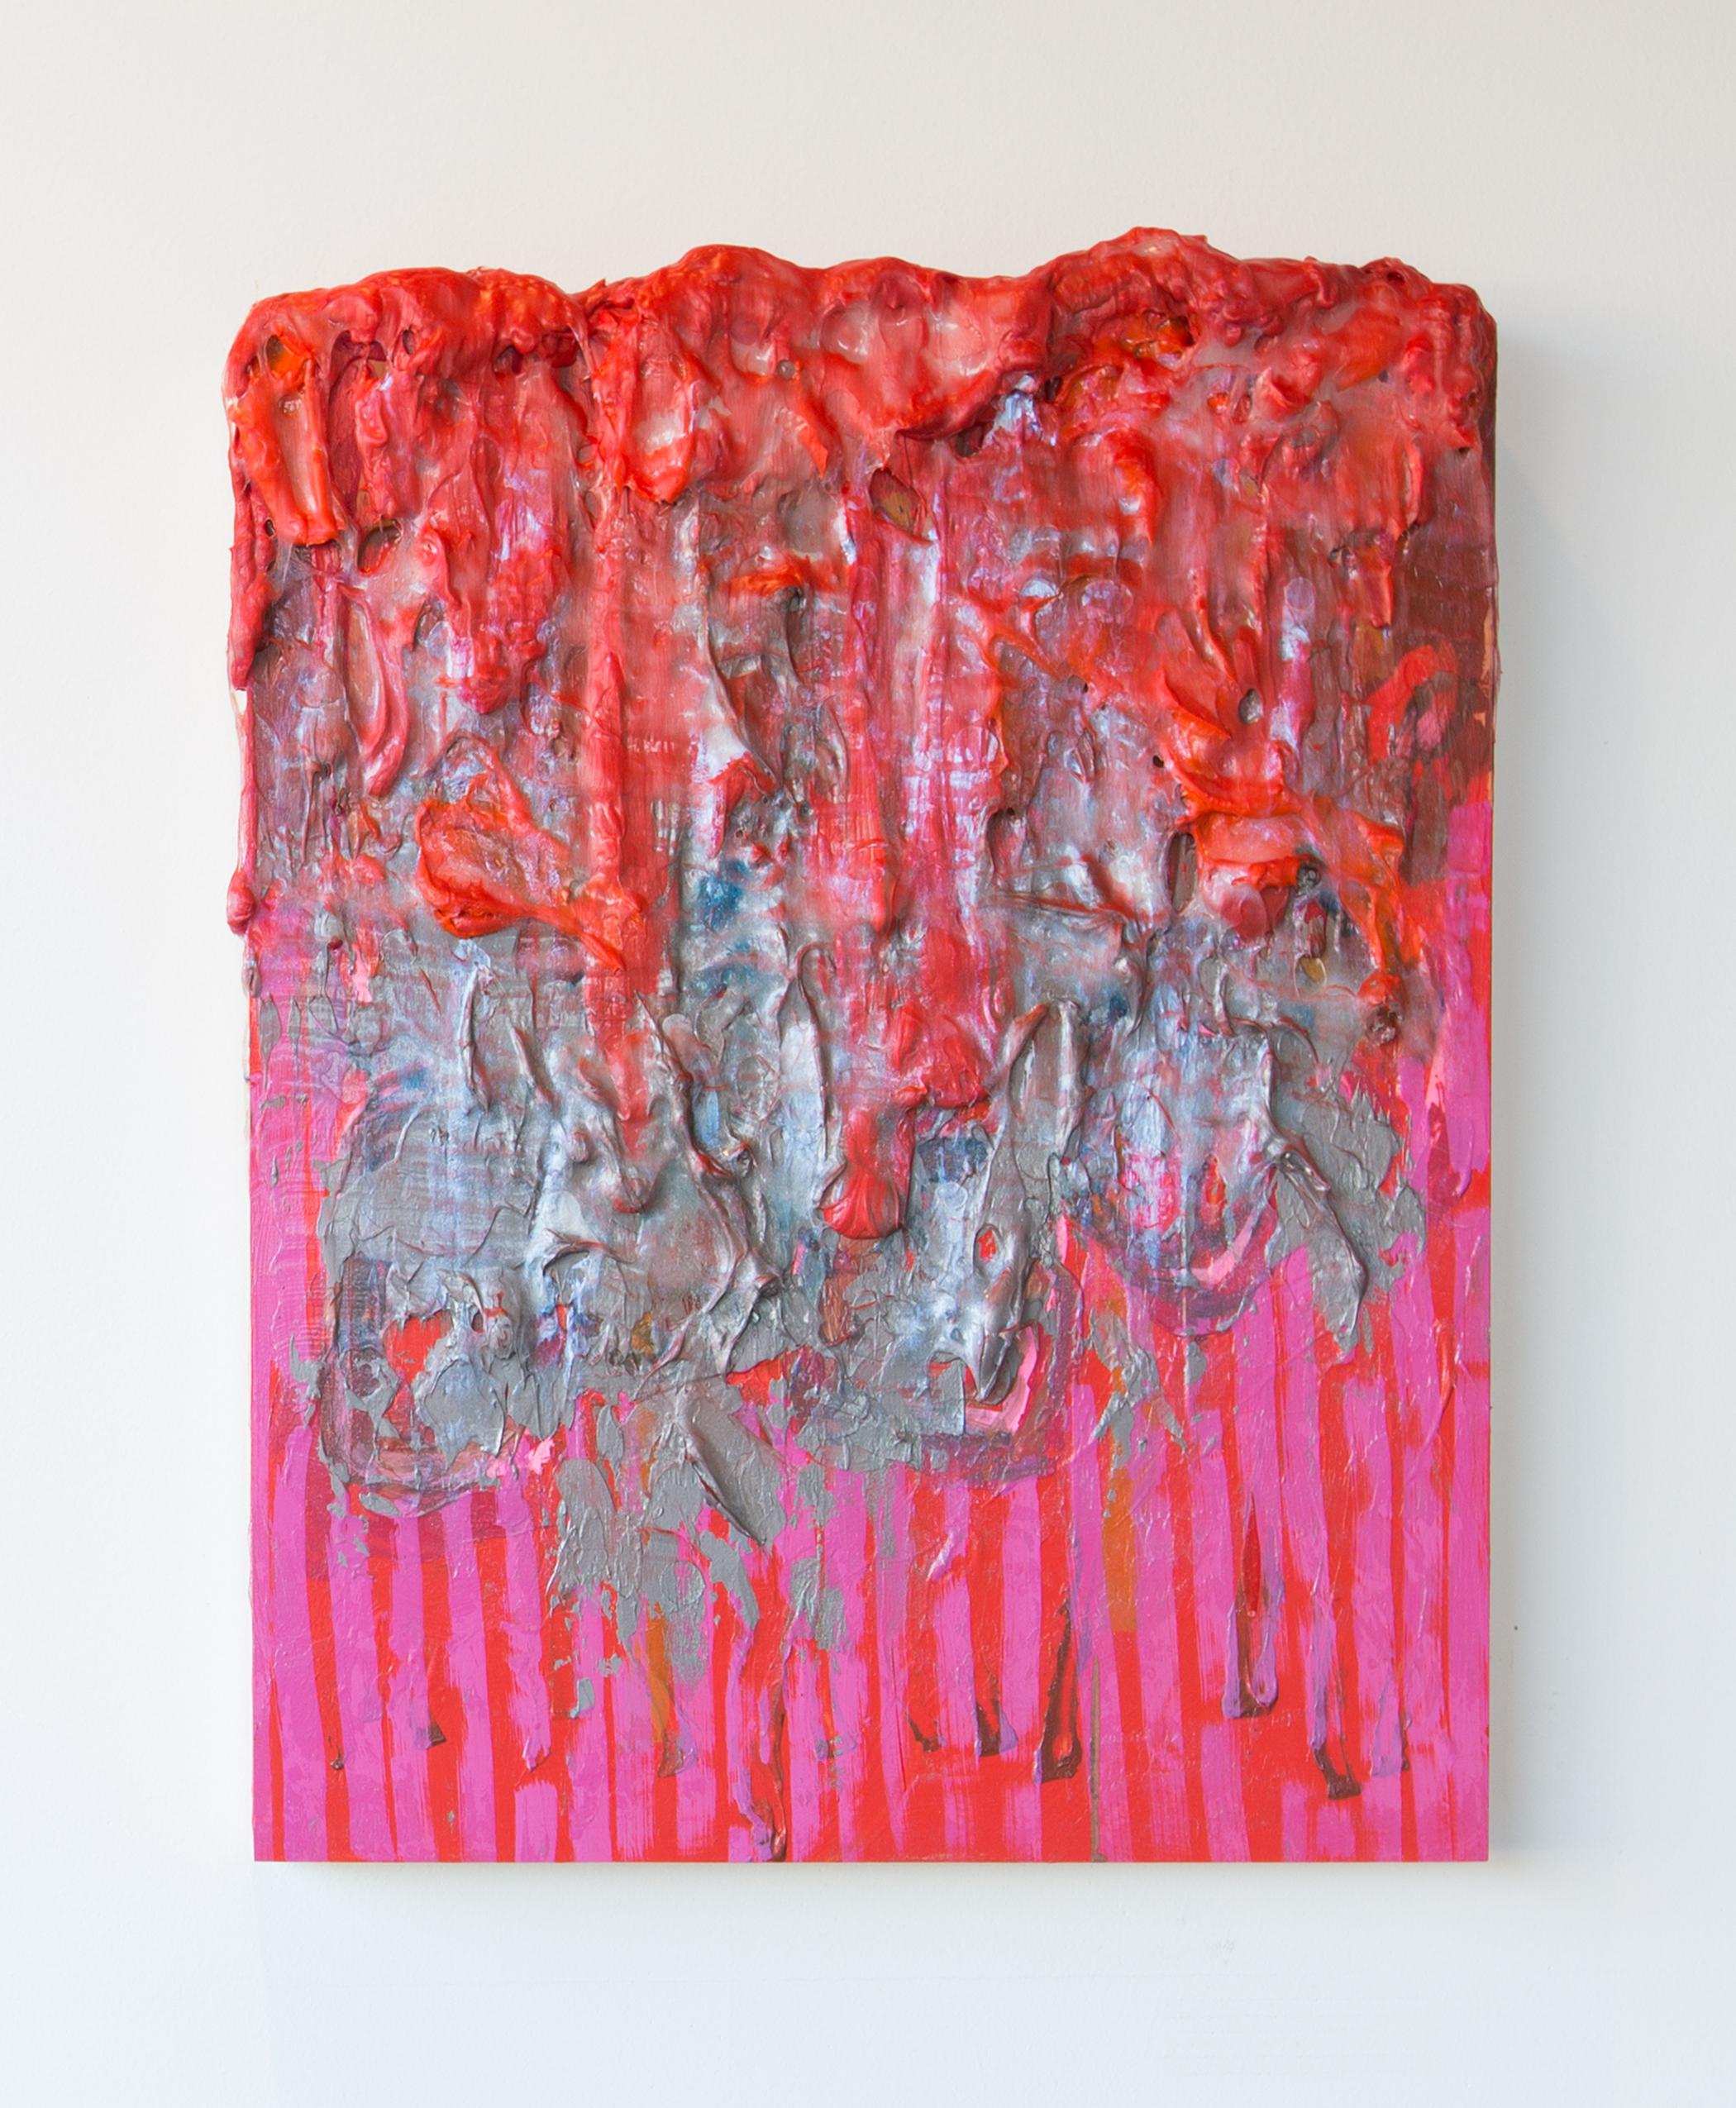 Joshua Thompson,  Accretions: Red Tide 2 , 2017